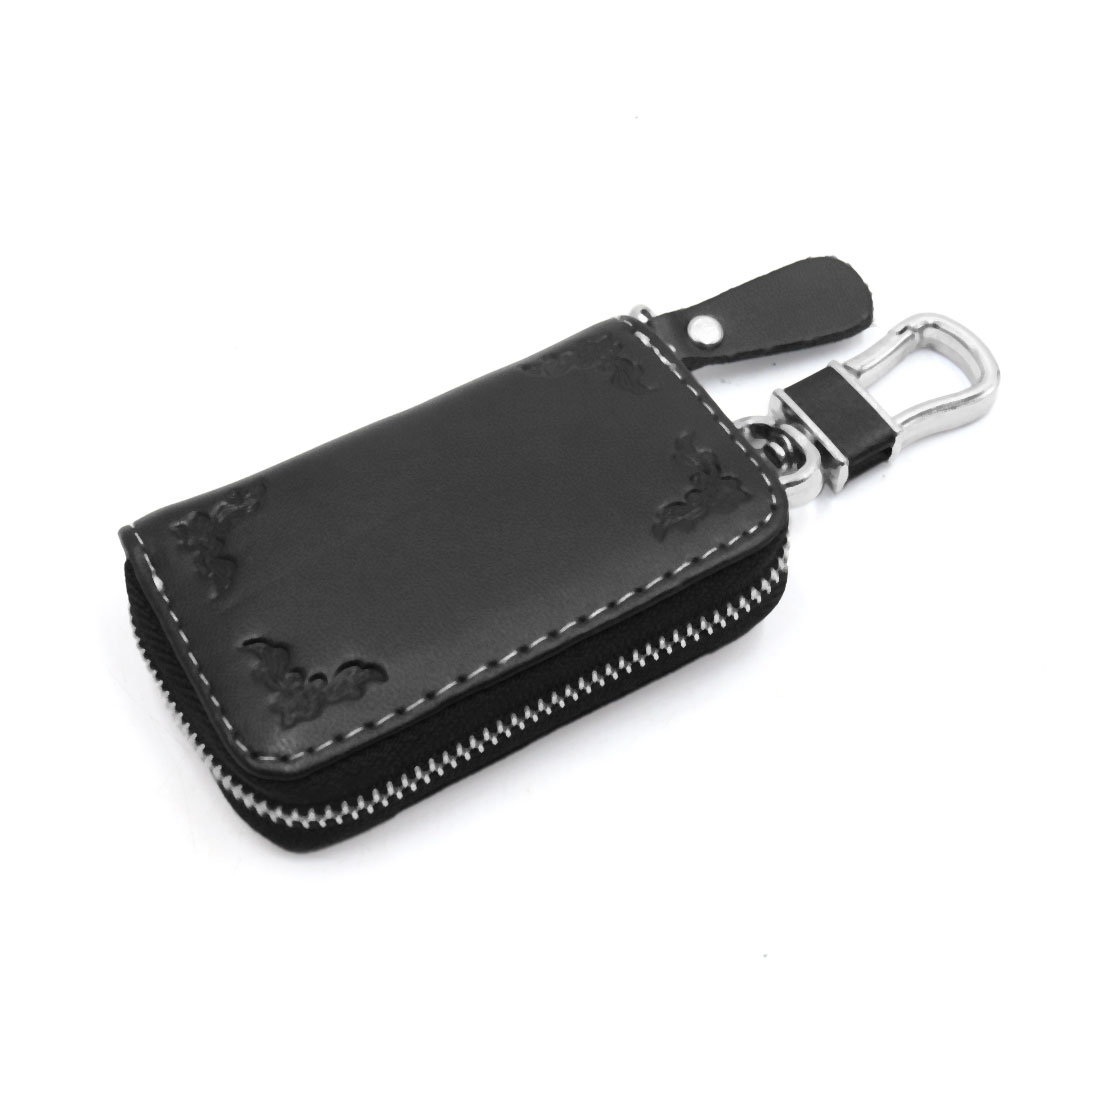 Universal Flower Printing Faux Leather Zipper Closure Car Key Holder Pouch Black